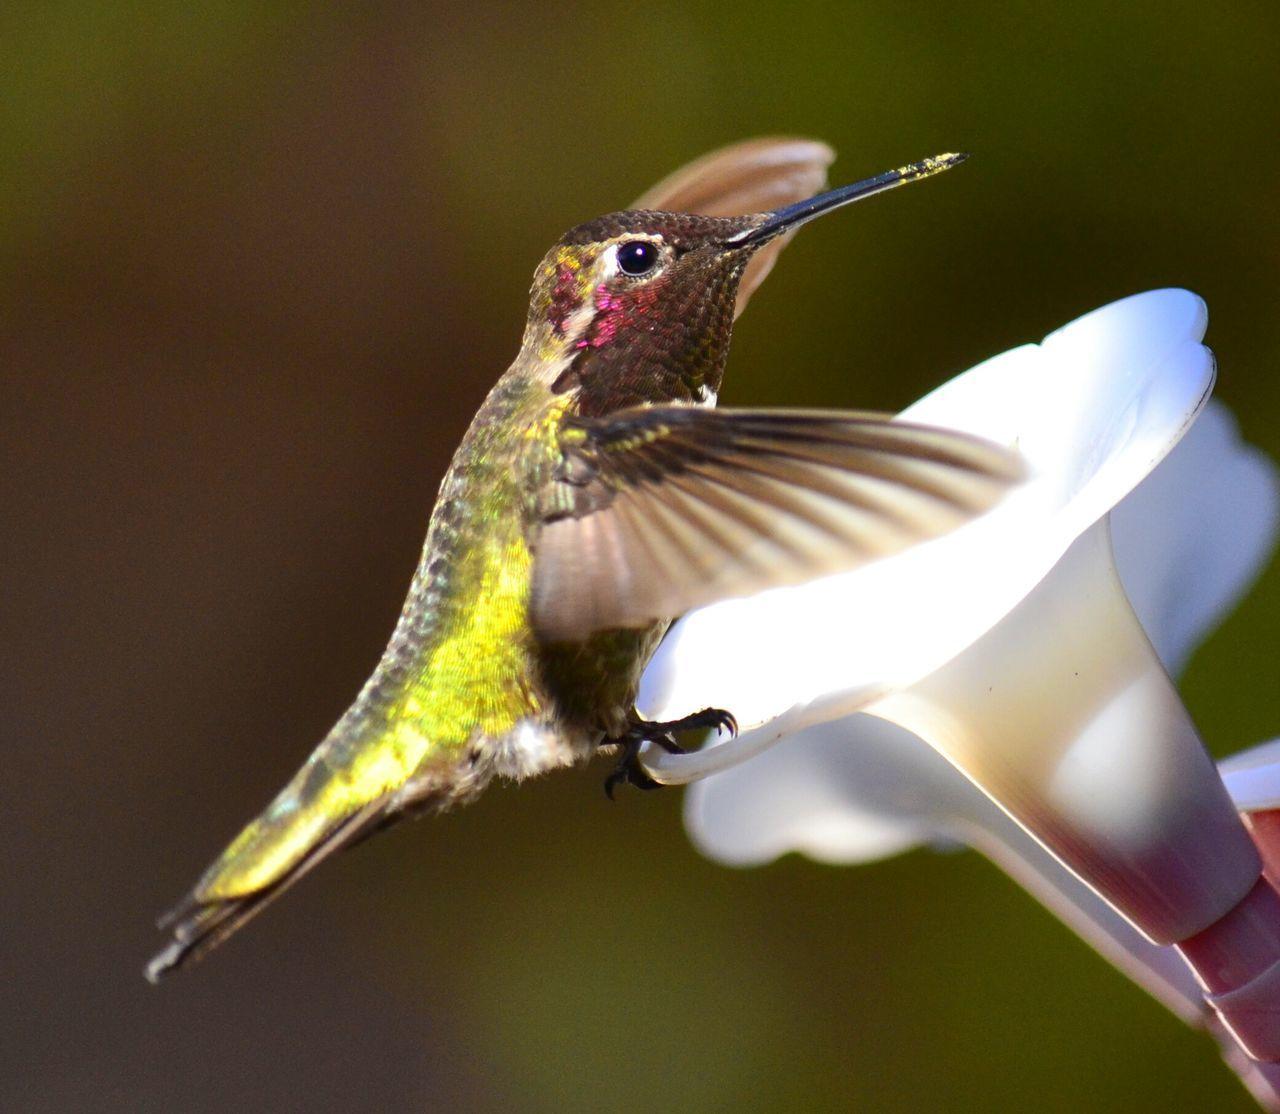 Life is a constant balancing act. Hummingbird Awesome_shots Nikon D3100 Nikon